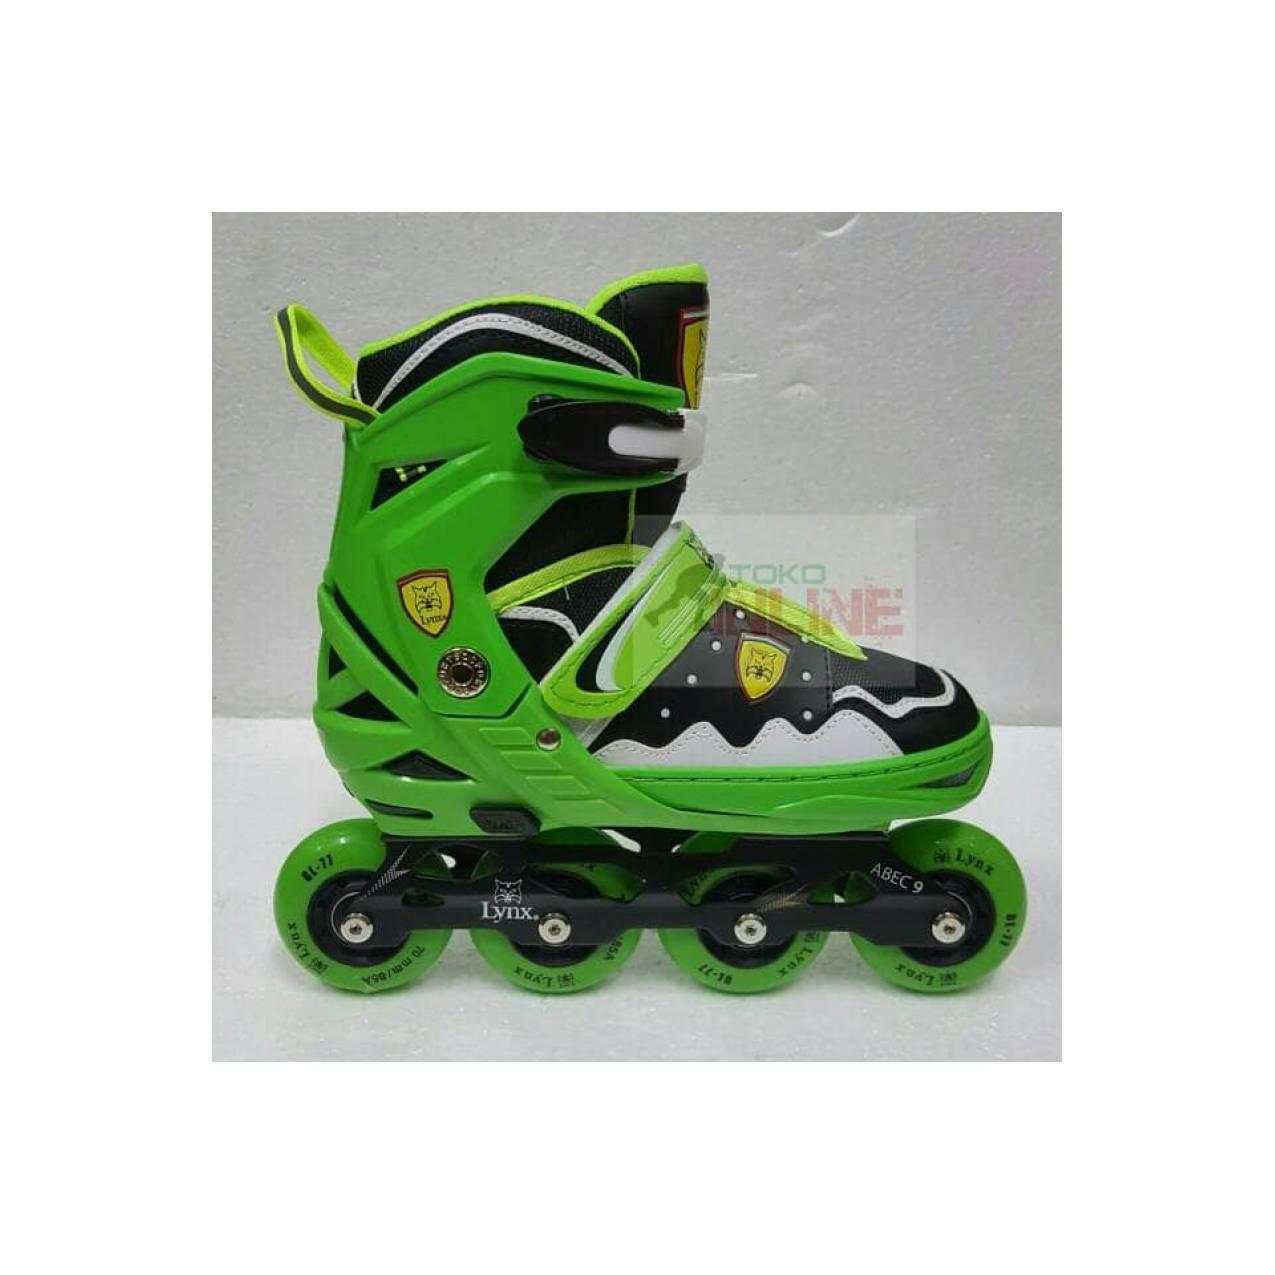 Sepatu Roda LYNX SC70 Recreational Inline Skate - Green Black